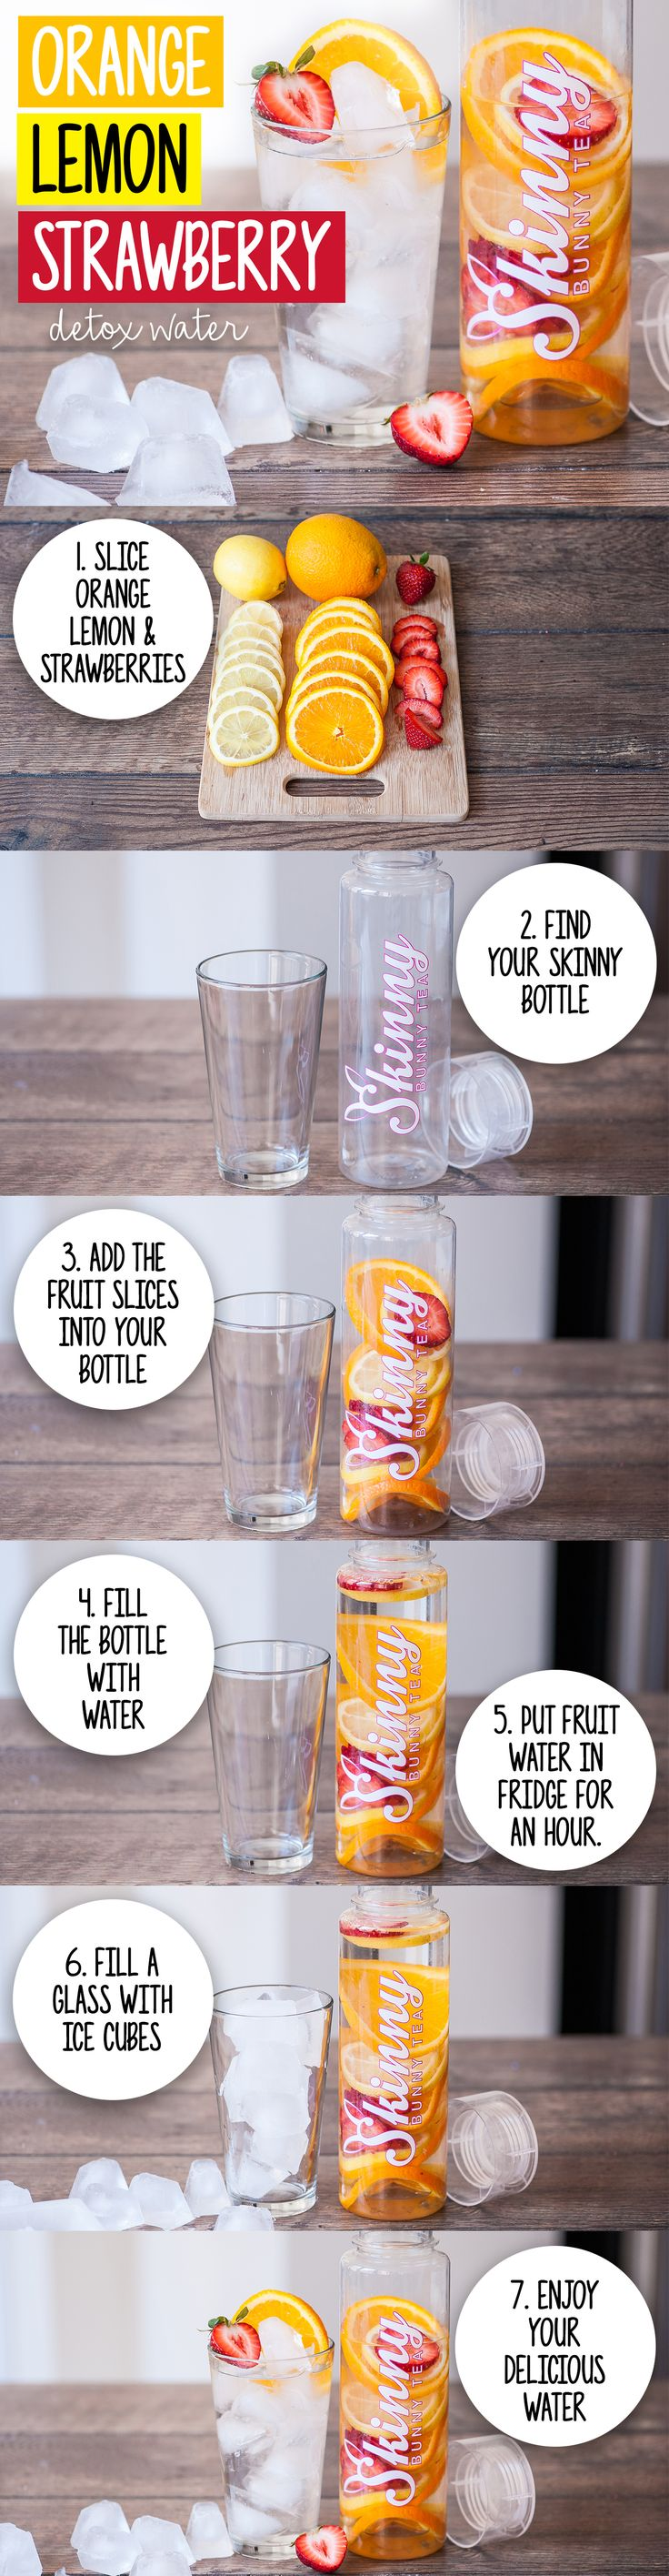 Cool off with this simple yet refreshing Orange Lemon Strawberry Detox Water recipe!! #Skinny #Detox #Fruit